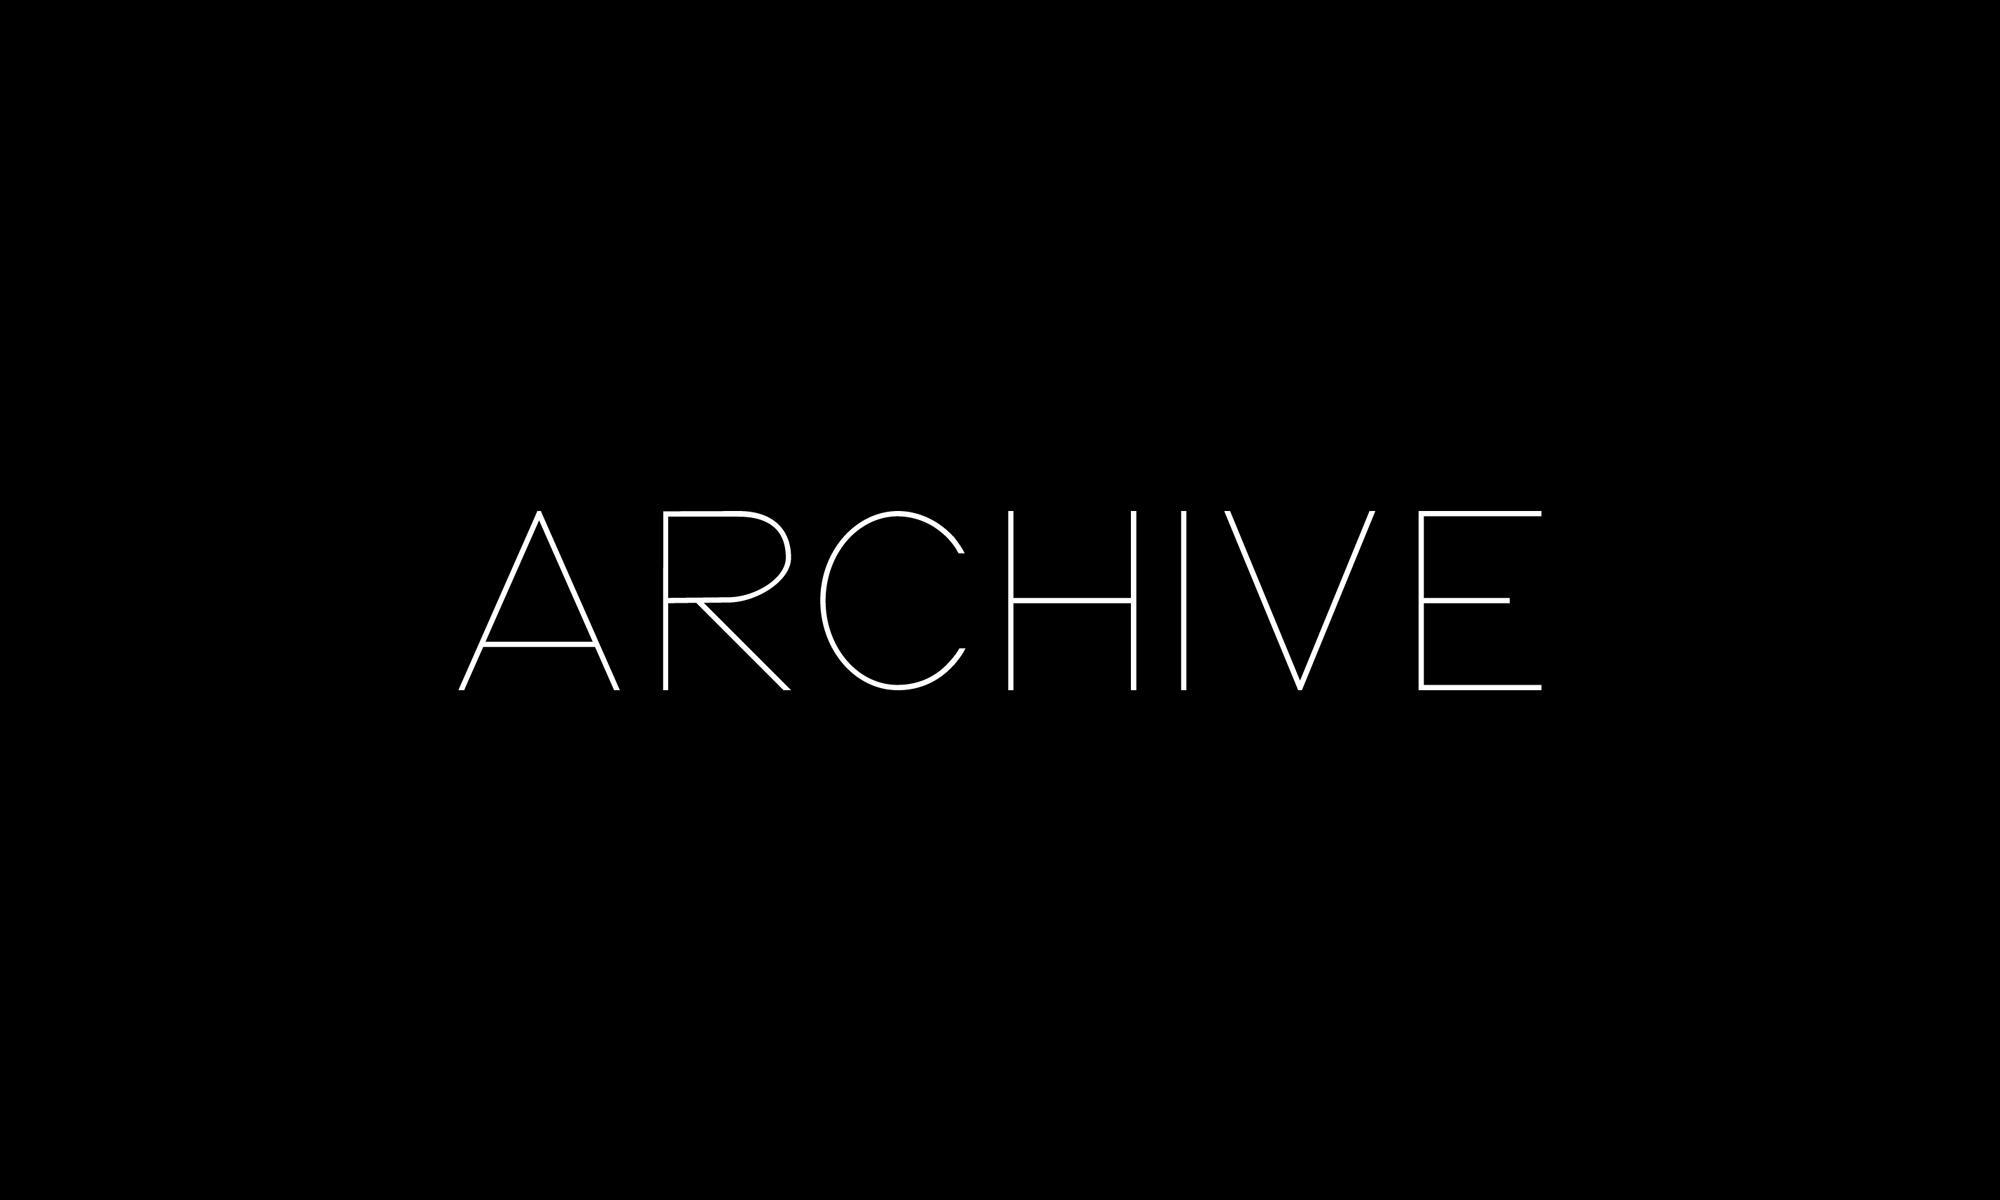 archive_title